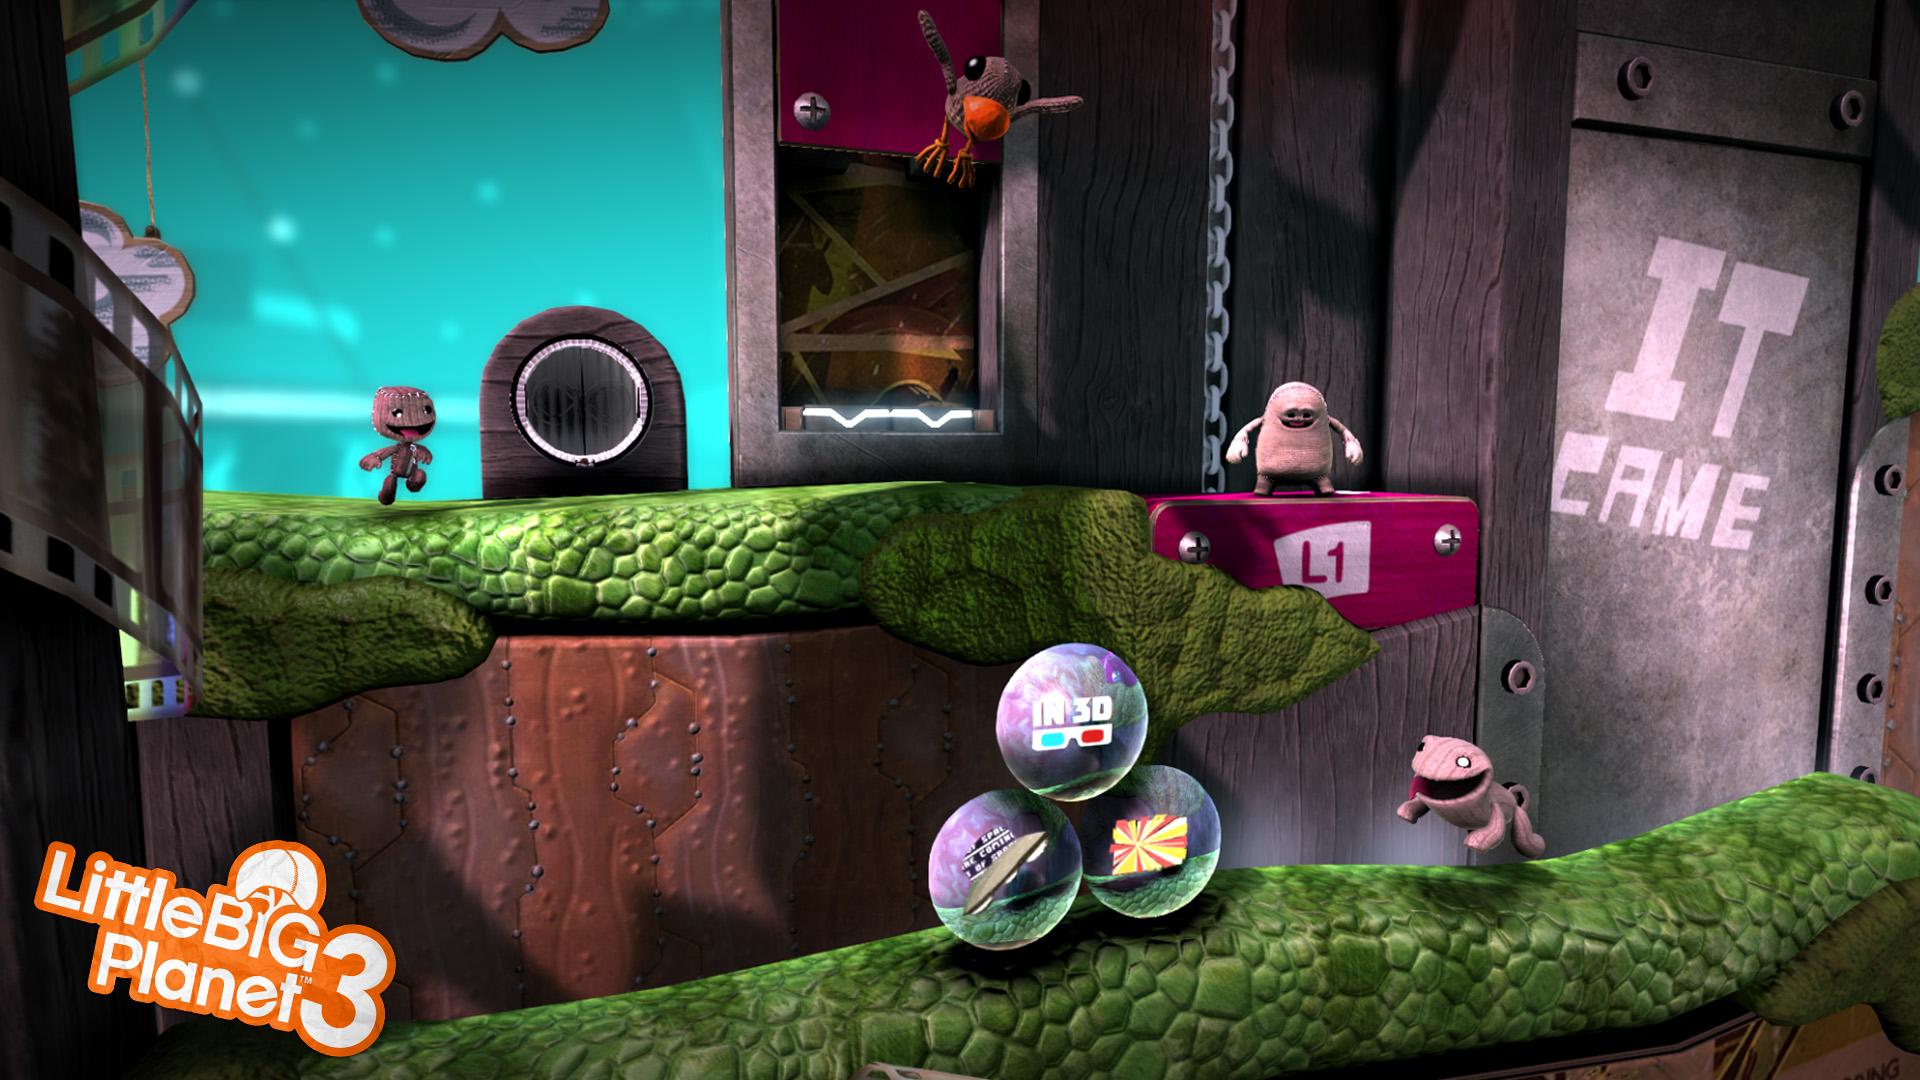 LittleBigPlanet3 PS4 Editeur 025